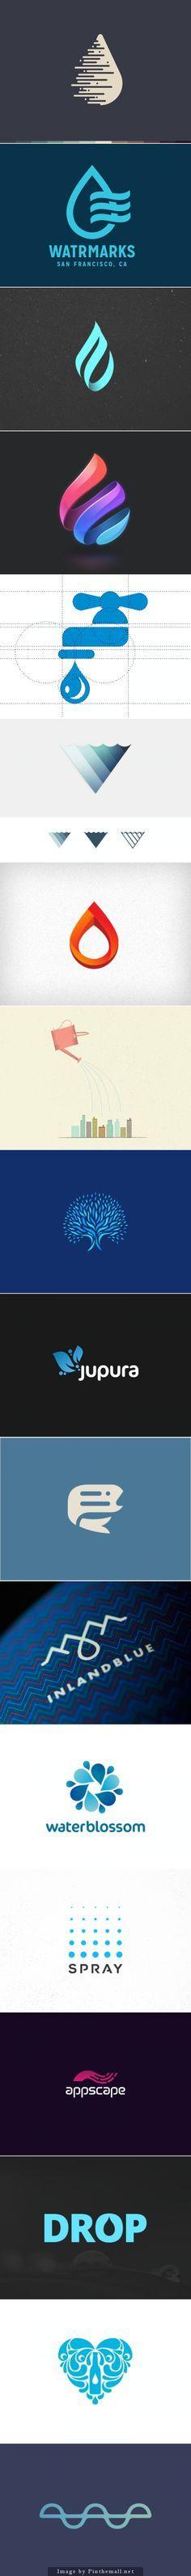 Water logos - created via http://pinthemall.net